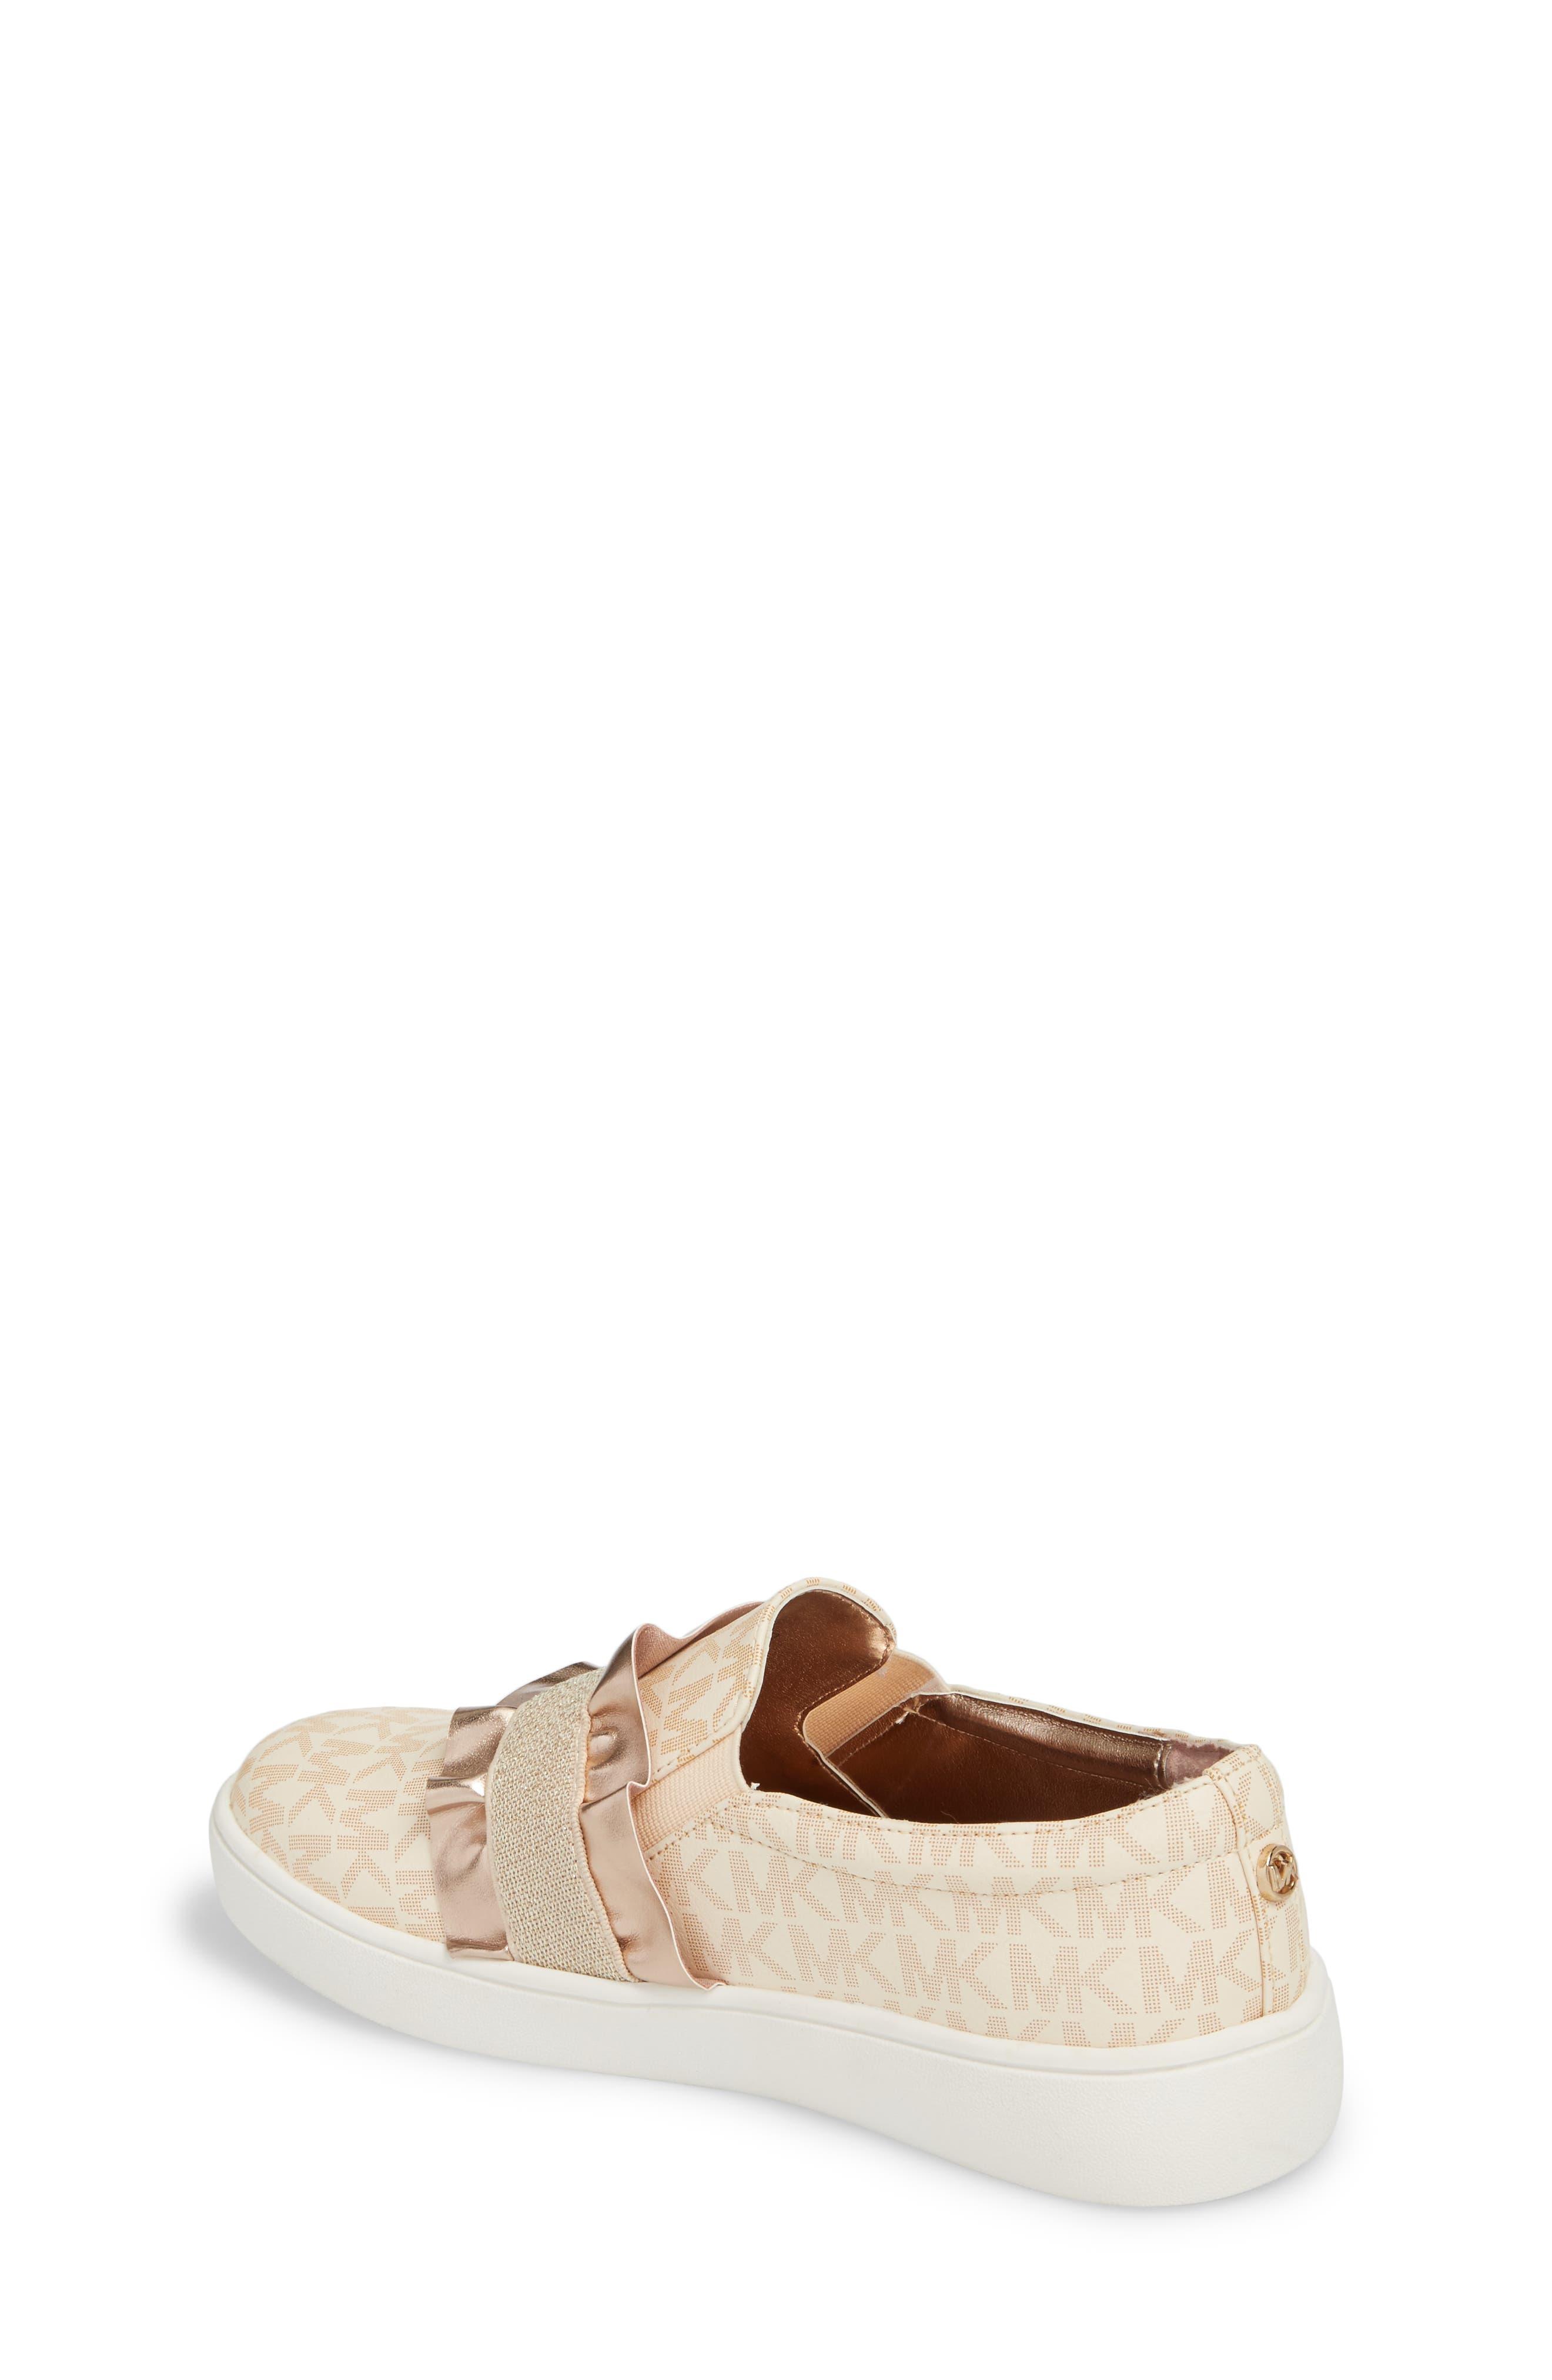 Ivy Riff Ruffle Sneaker,                             Alternate thumbnail 2, color,                             ROSE GOLD